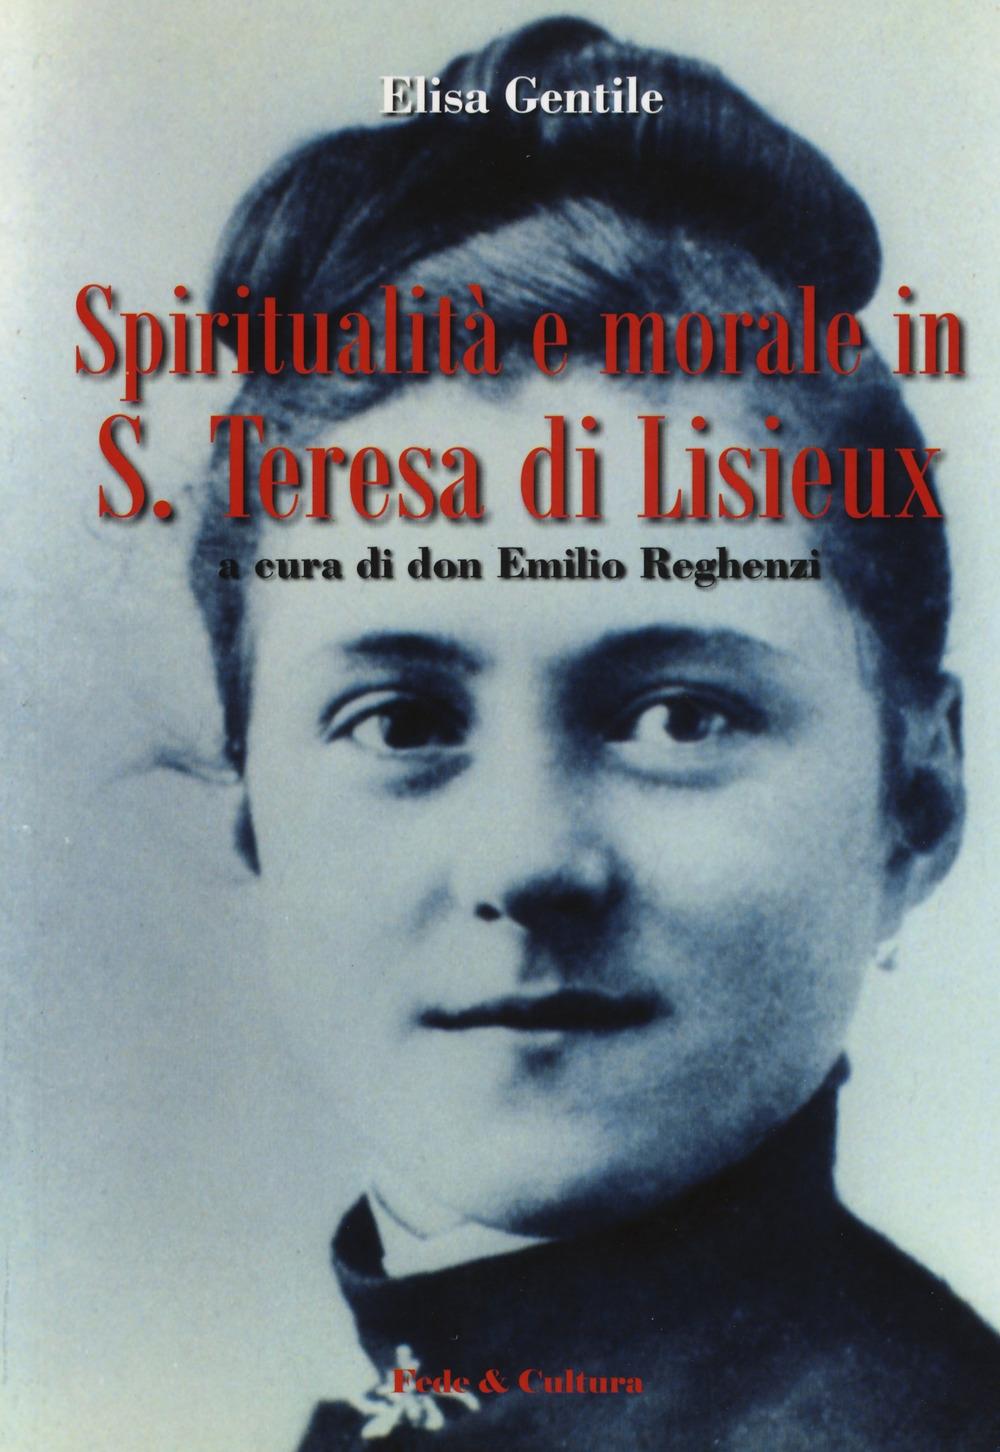 Spiritualità e morale in S. Teresa di Lisieux